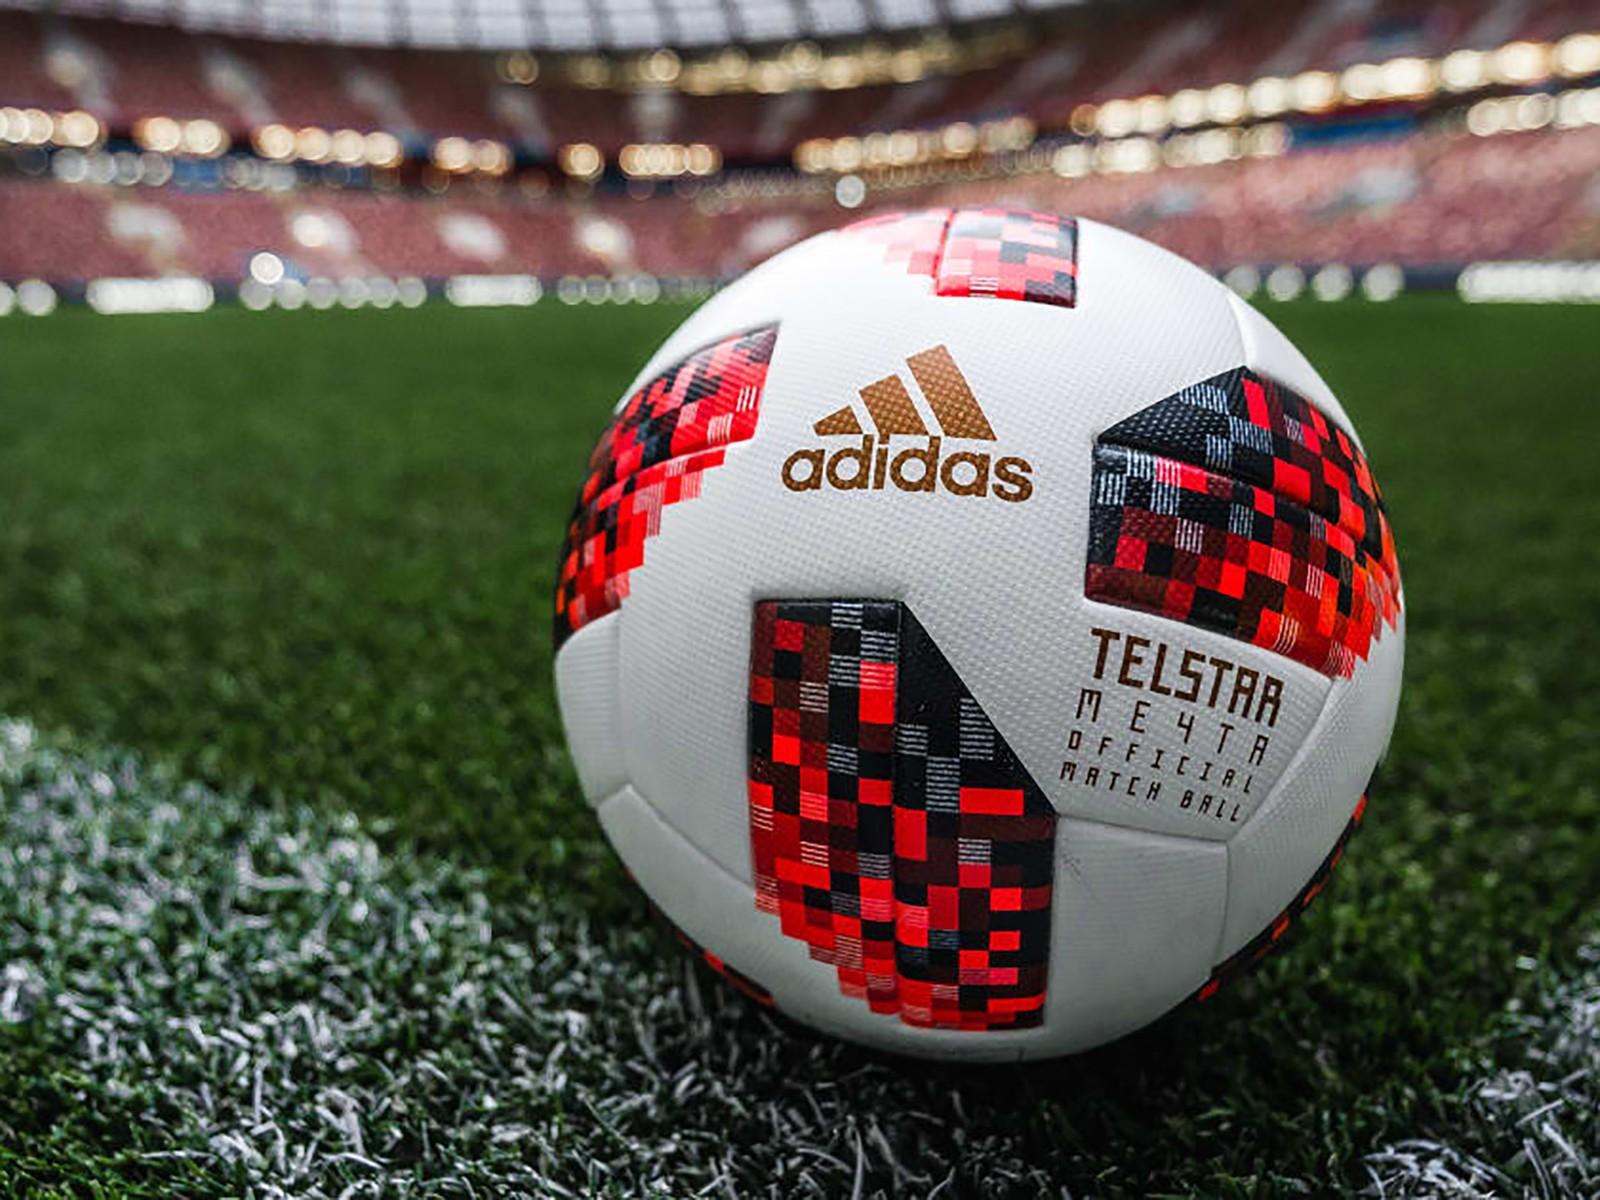 006 Soccer Vs Football Compare And Contrast Essay Fifa Ballitoka16rn Ju Excellent Full